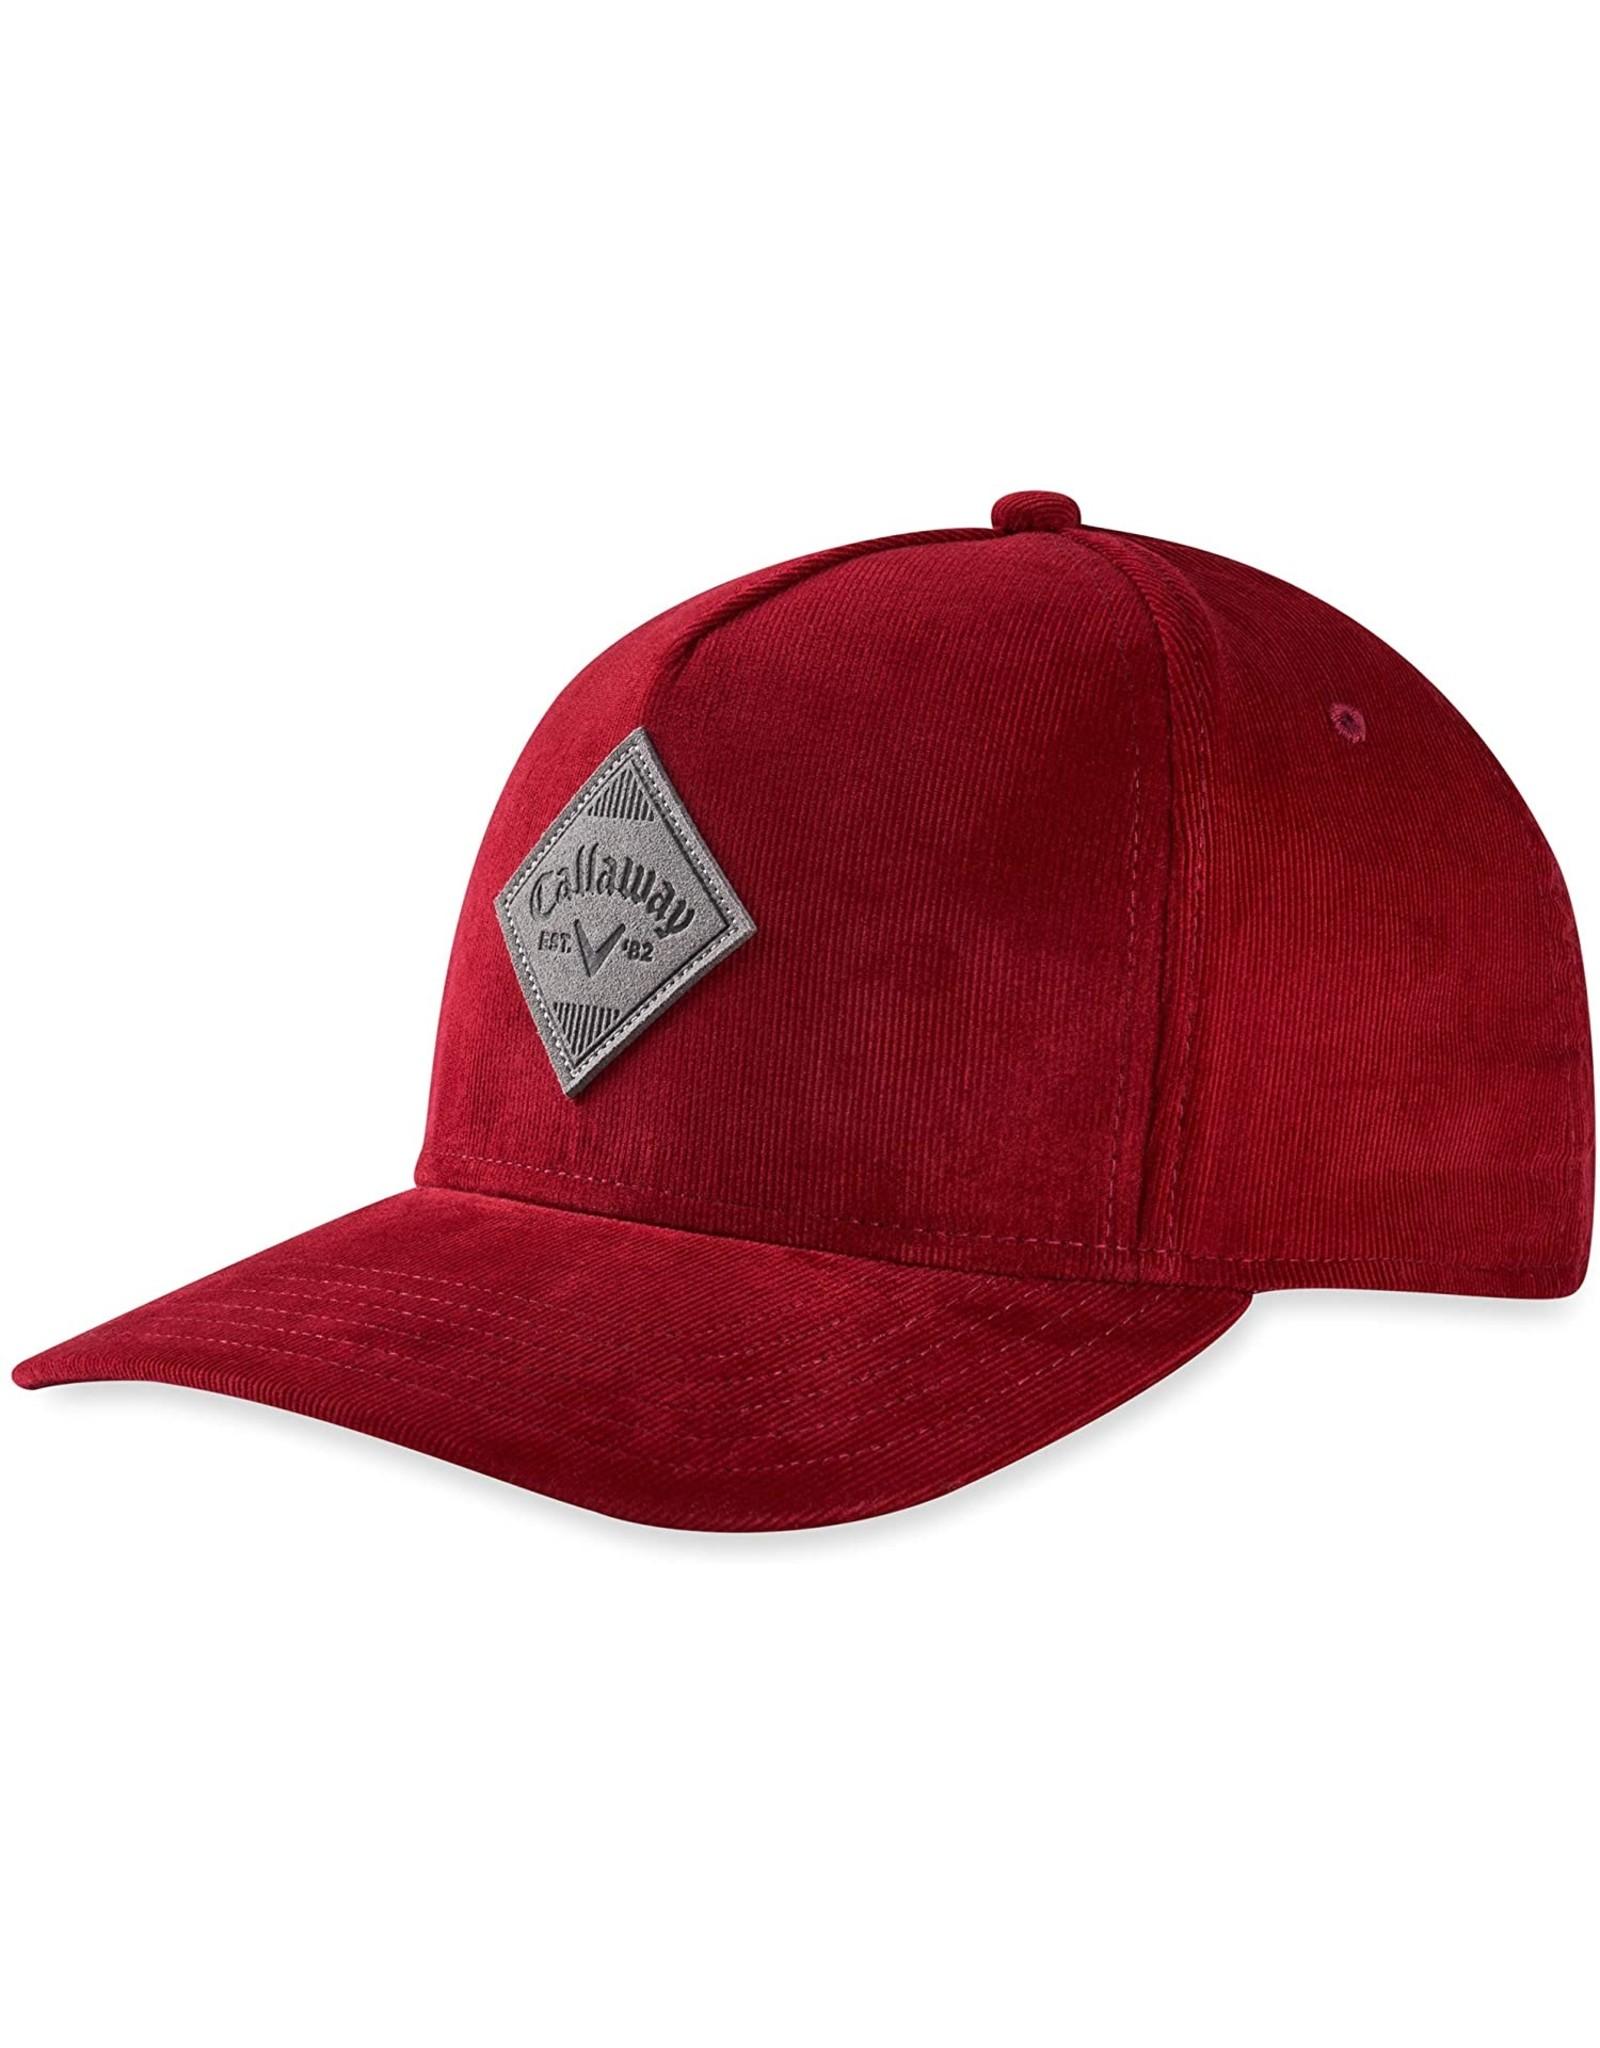 Callaway Callaway Cord Adj. Hat (20')